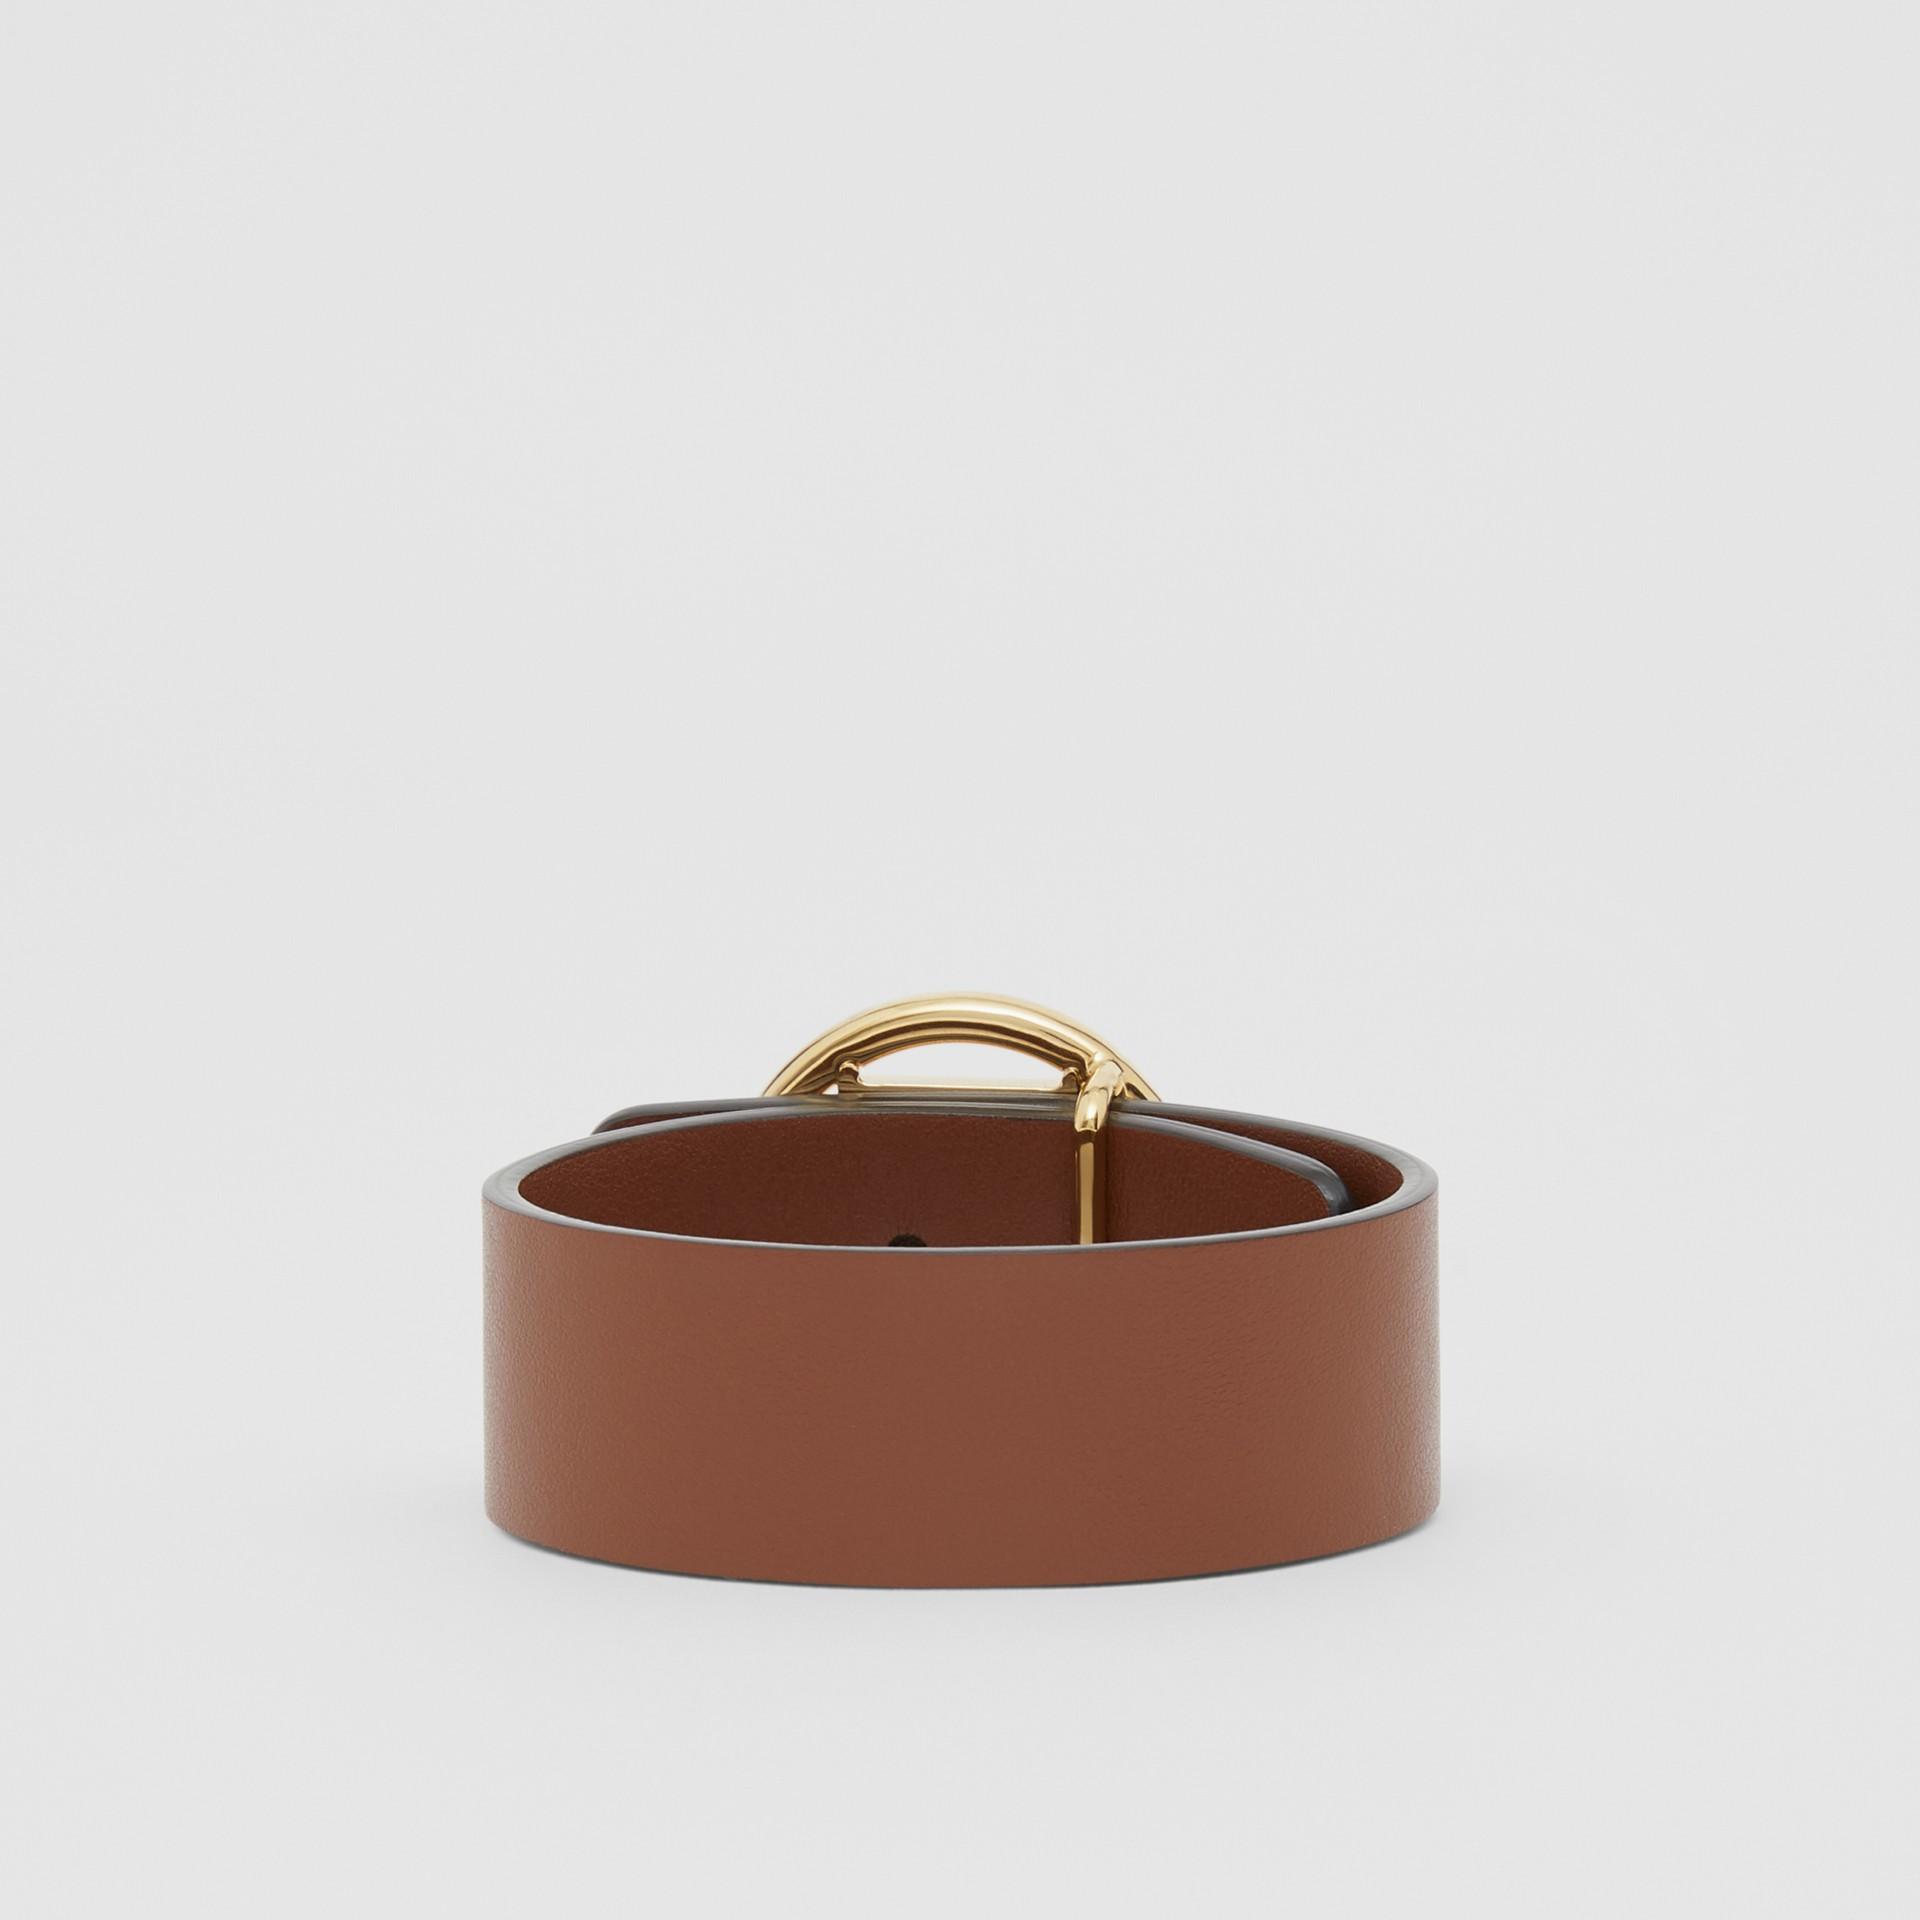 Monogram Motif Leather Bracelet in Tan - Women | Burberry - gallery image 2